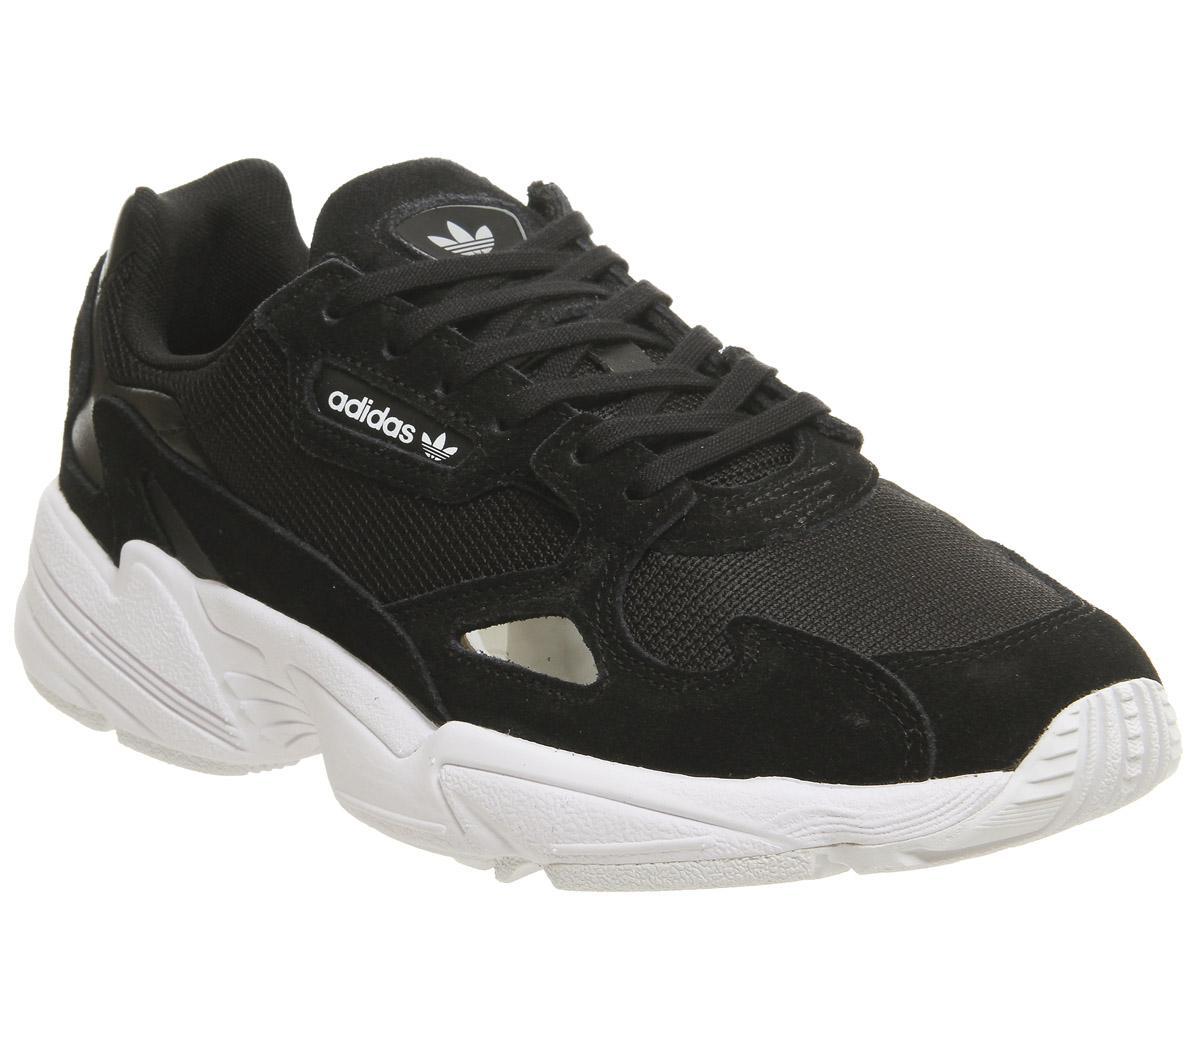 Core Adidas Falcon Trainers Sneaker Black Damen White 8wXnk0OP